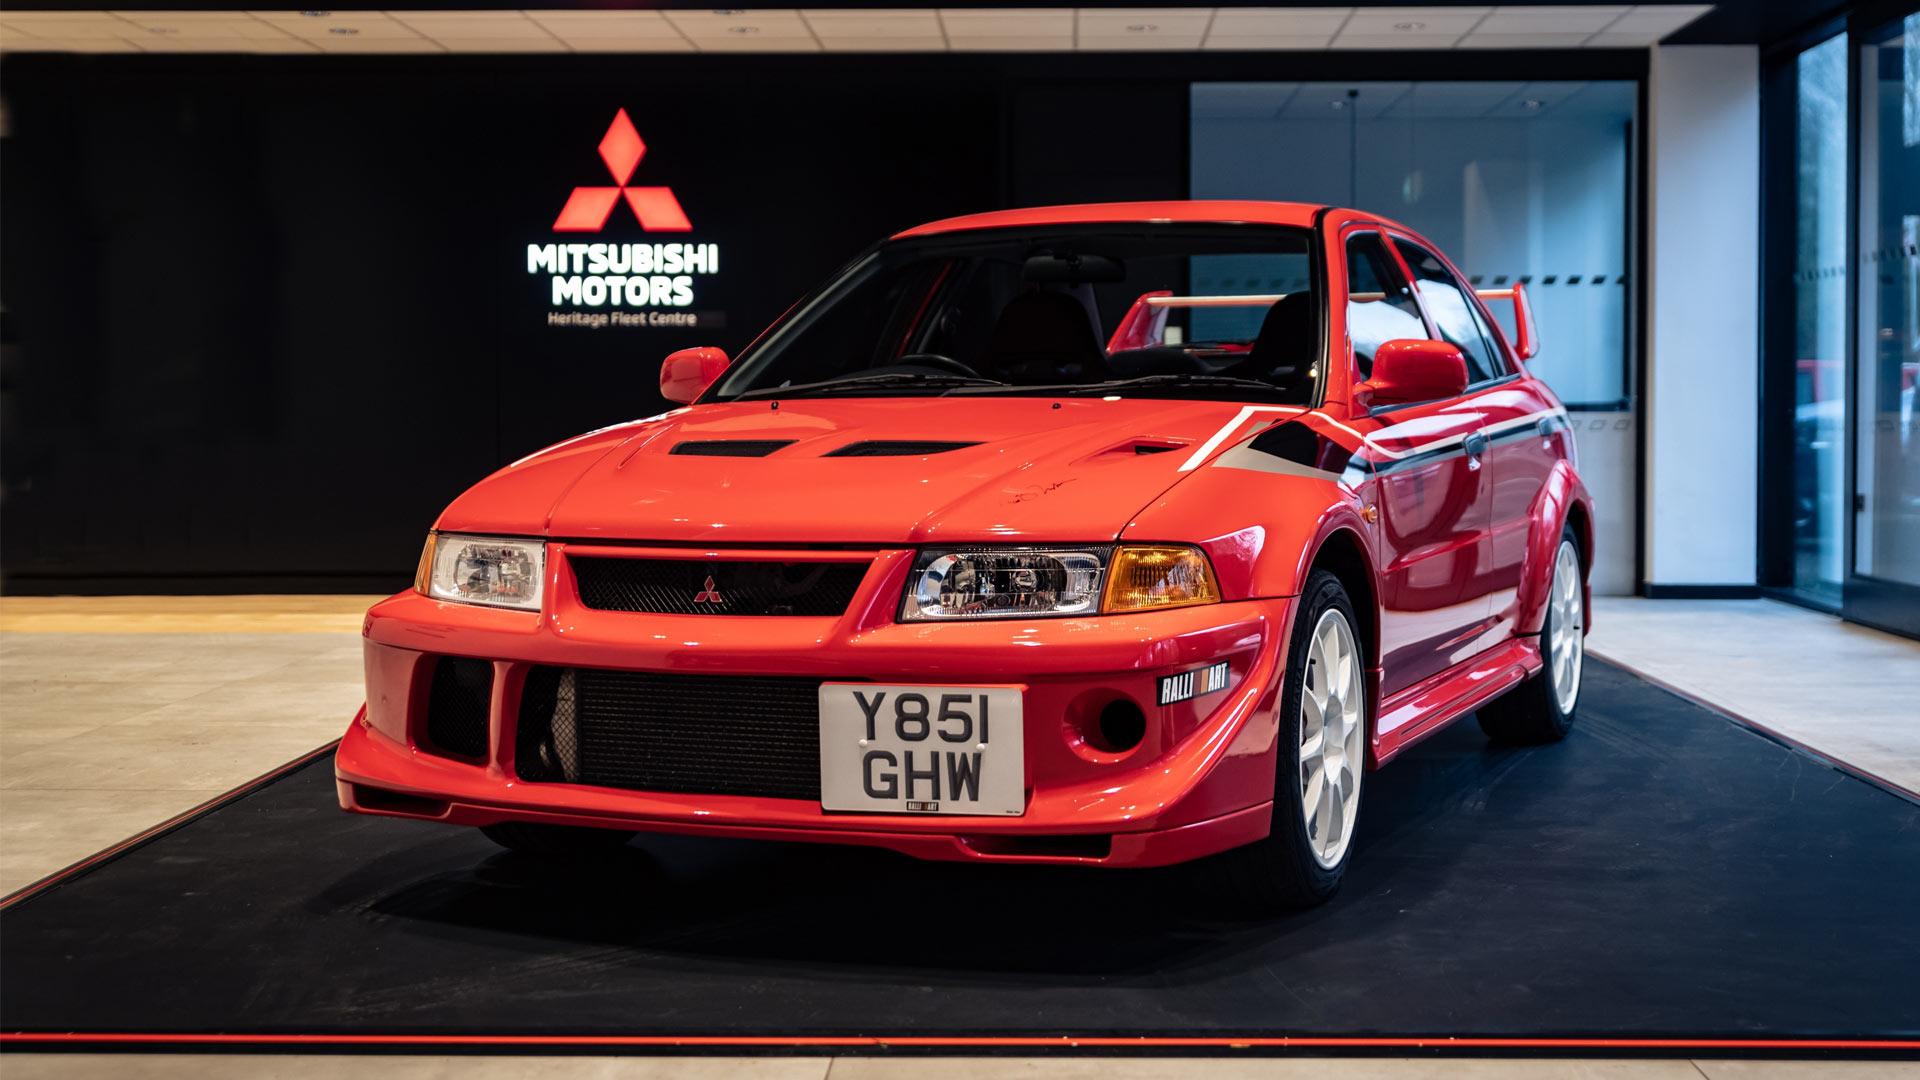 A red Mitsubishi Lancer Evo on display